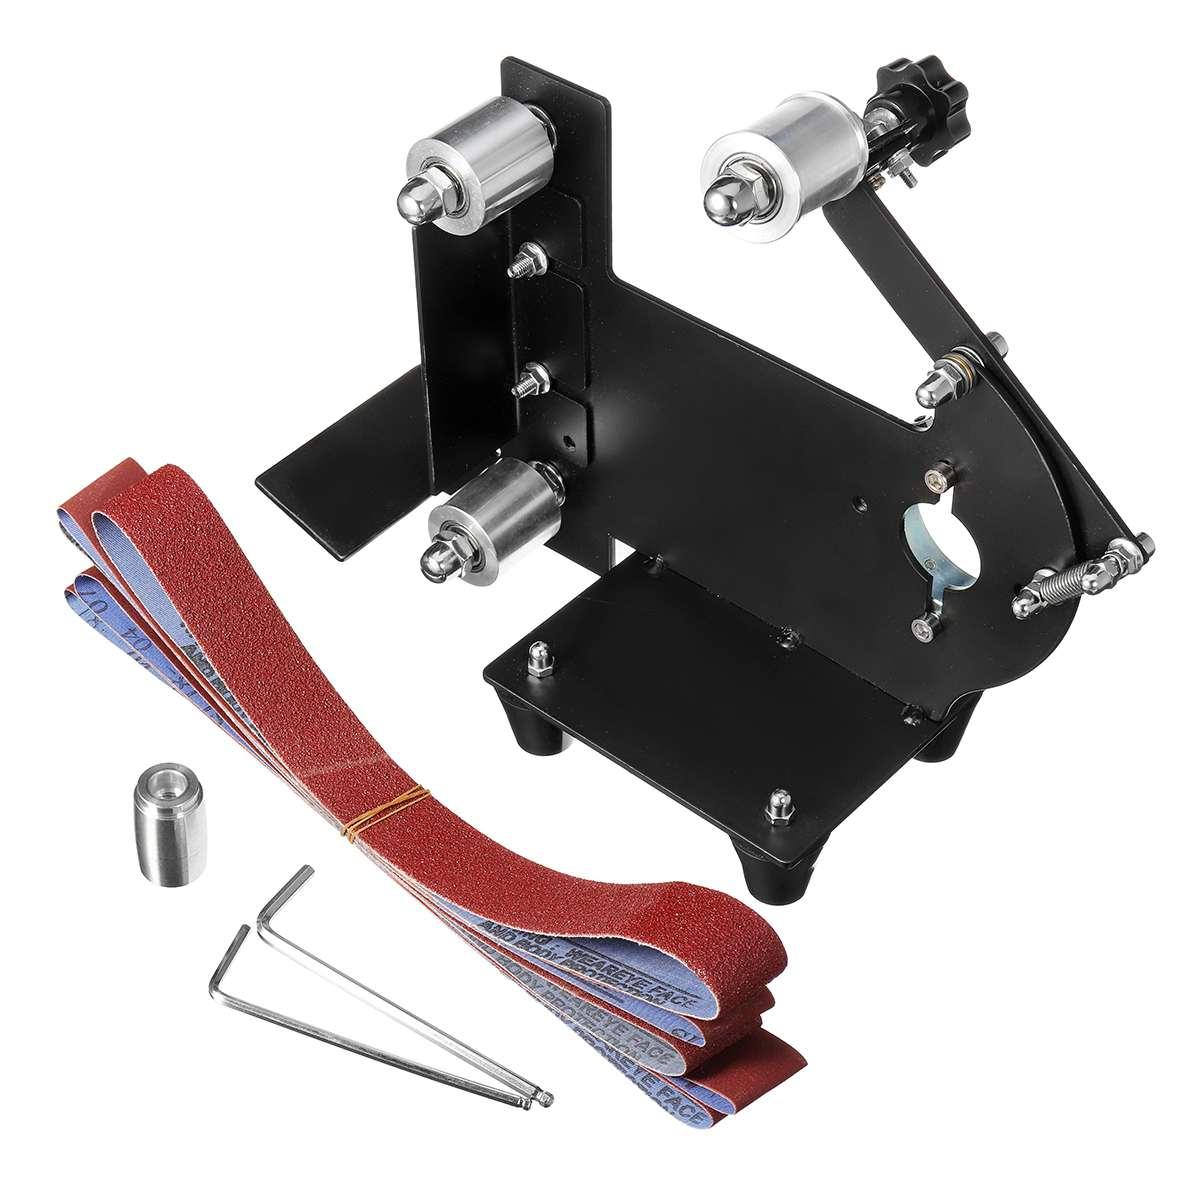 Angle Grinder Sanding Belt Sander Rack 10mm Metal Wood Sanding Adapter Machine Polishing Woodworking Tools Set Attachment